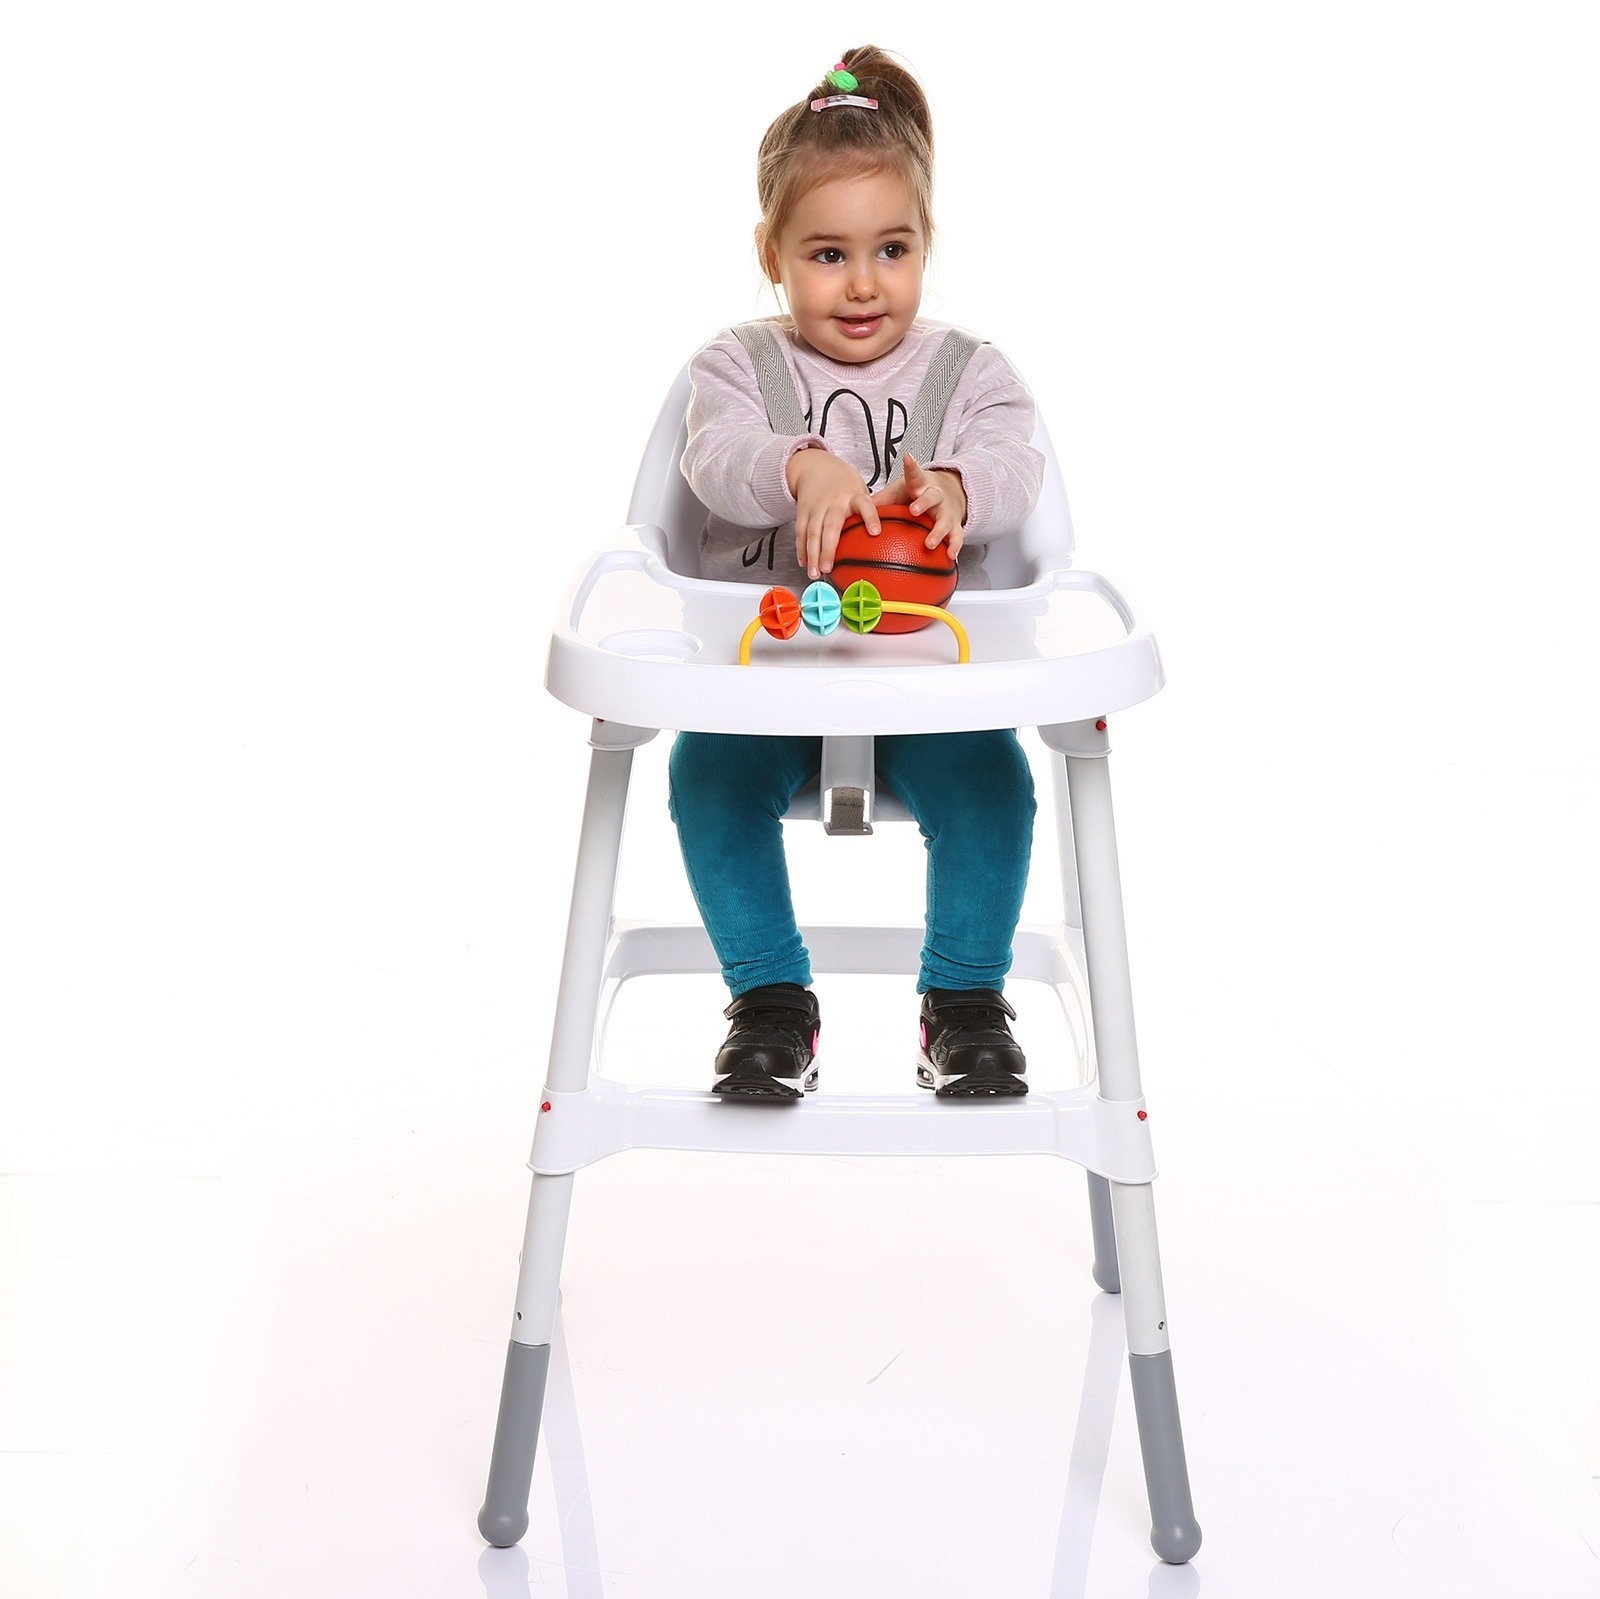 Ebebek Baby&plus Diny Foldable Baby Feeding High Chair